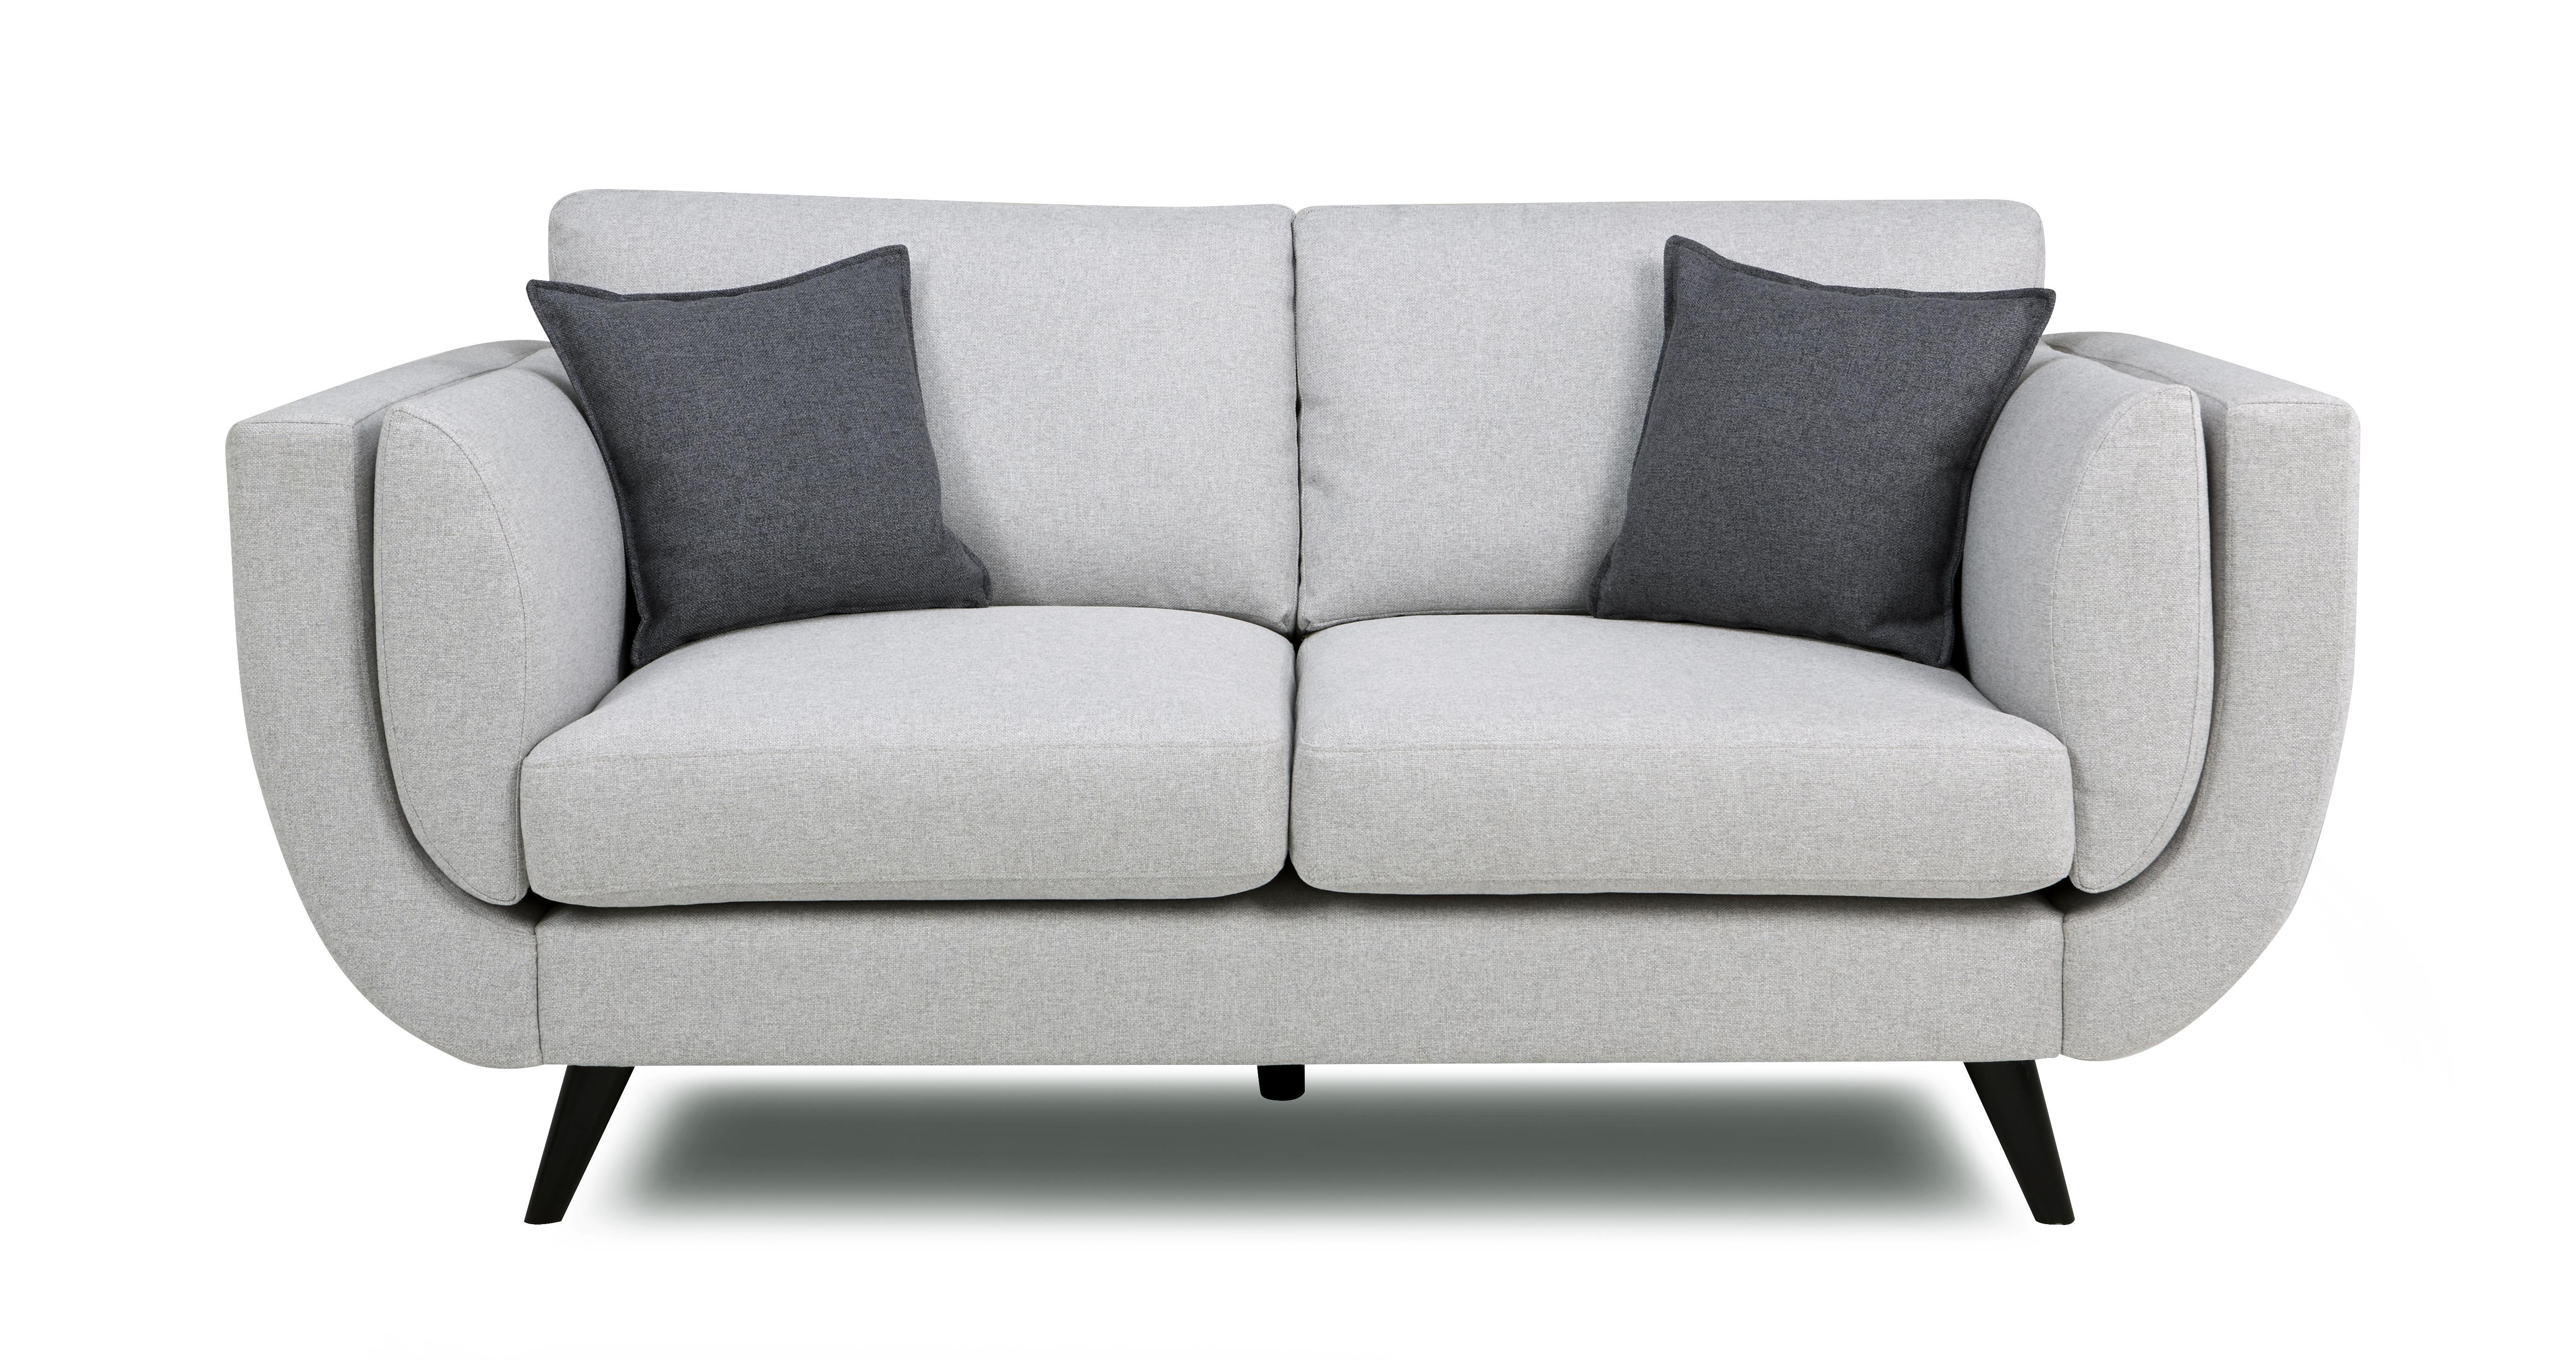 sofa company nl bed nebraska furniture mart zuri medium bank dfs banken